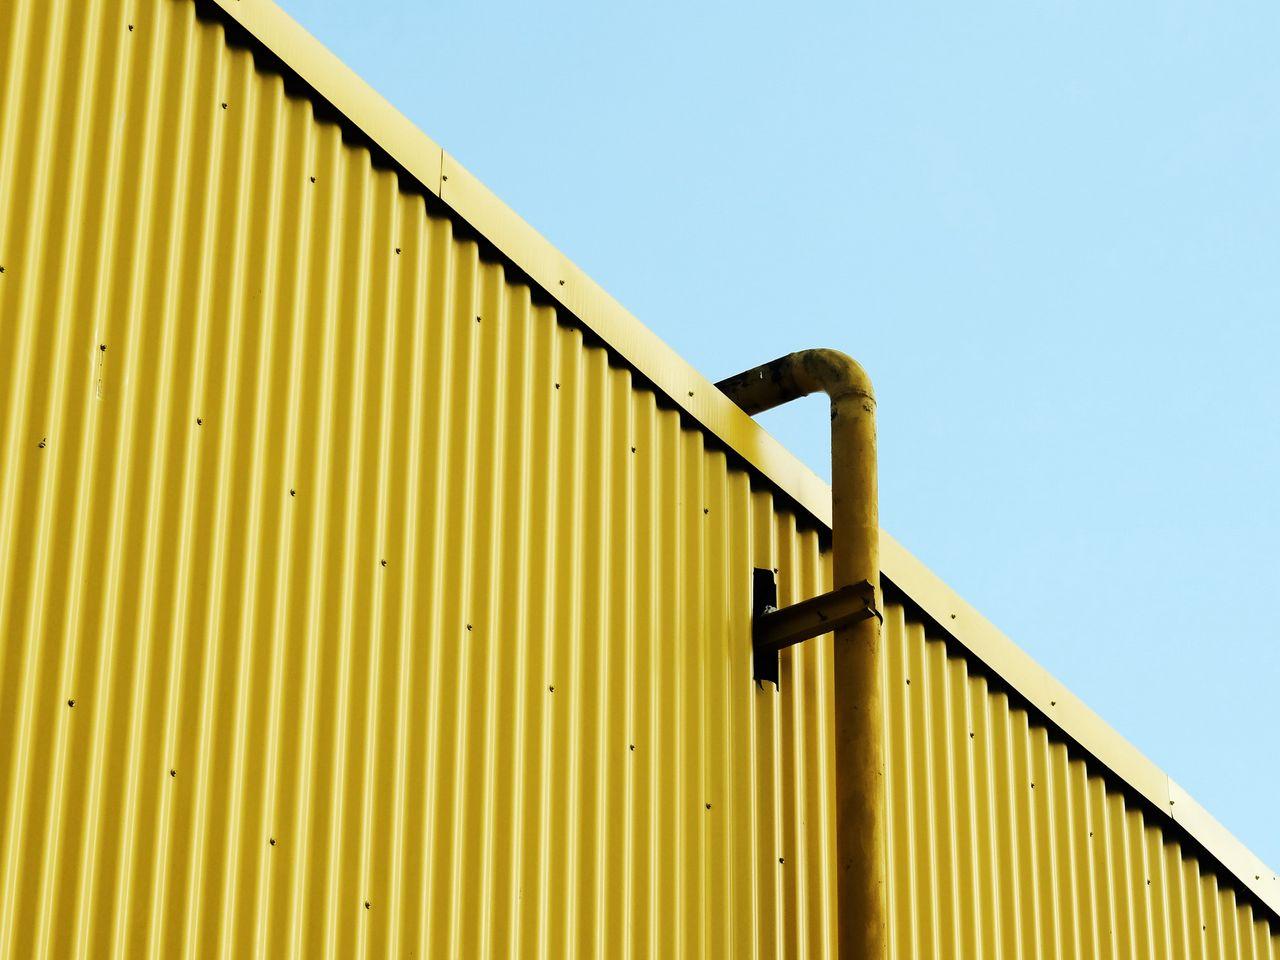 1280x960 Wallpaper building, pipe, yellow, minimalism